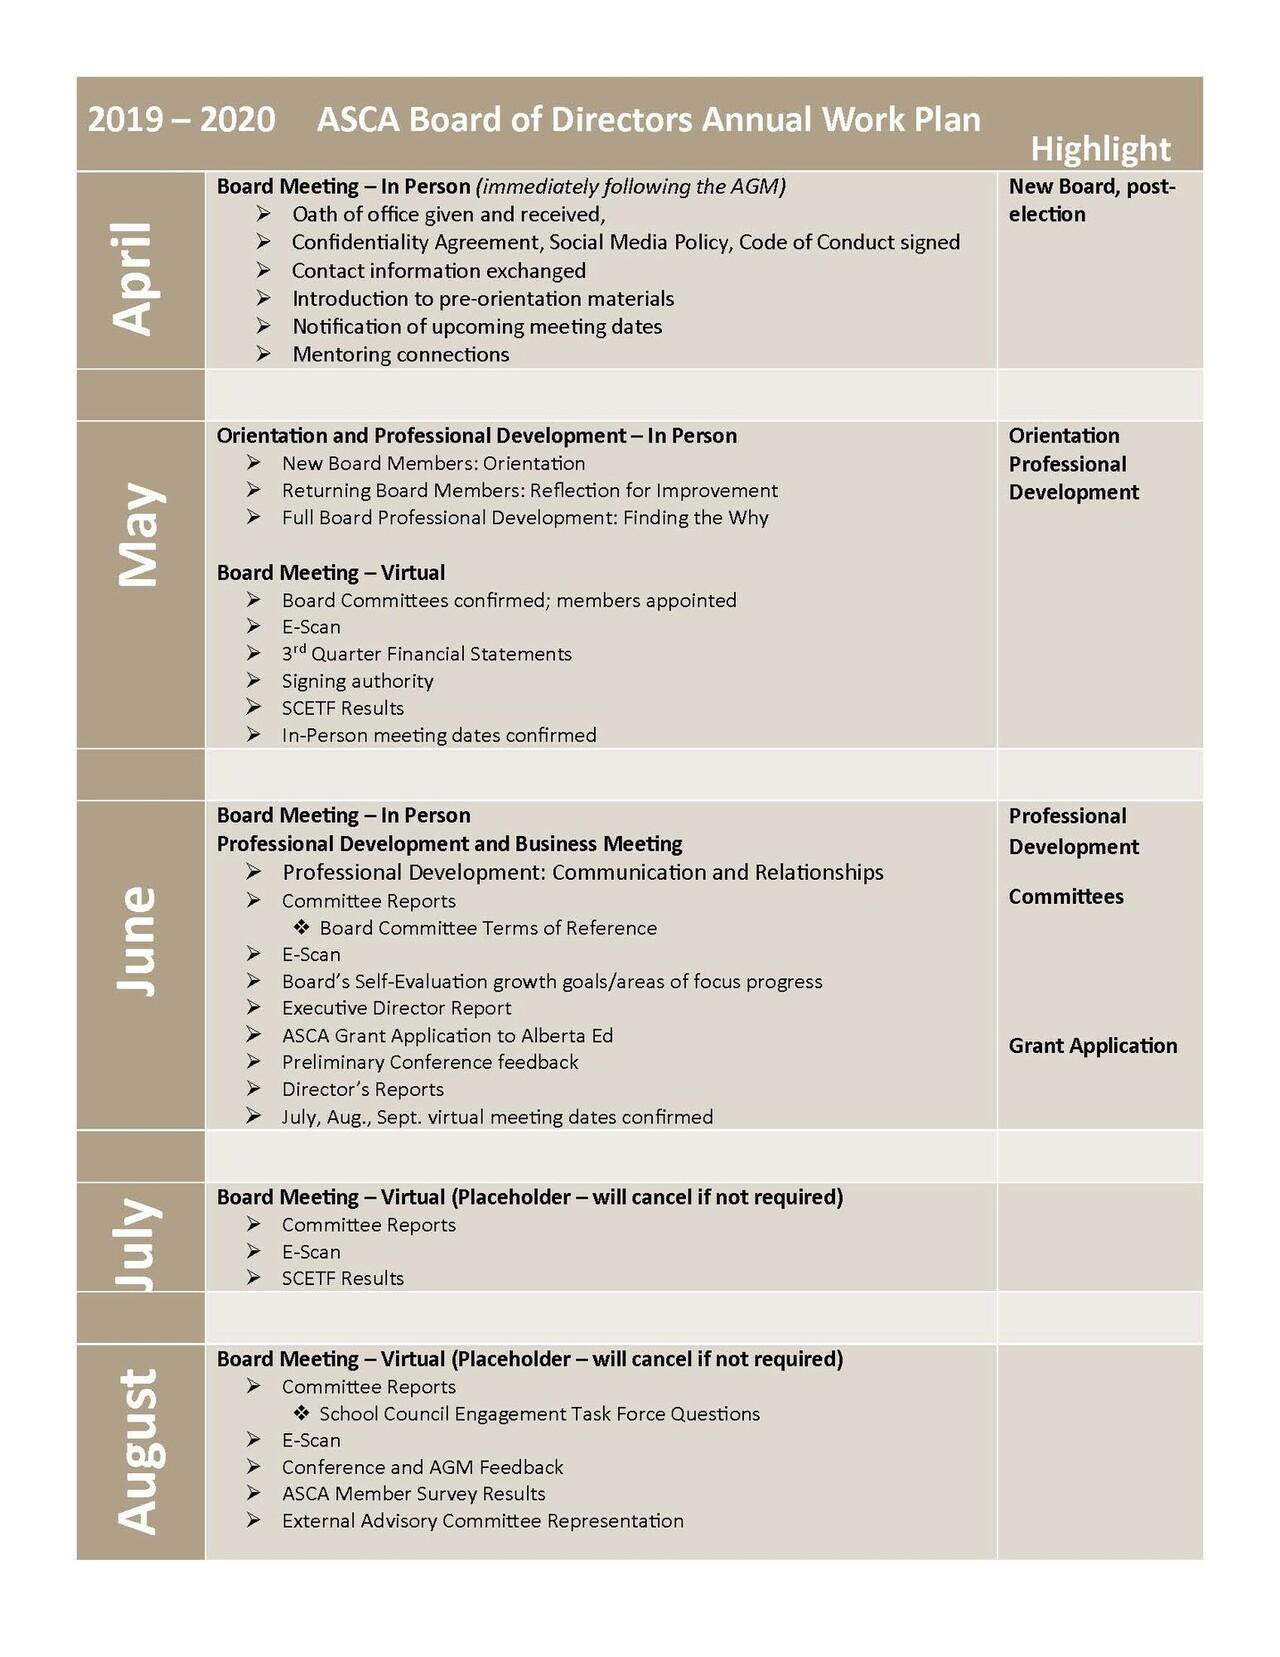 Annual Work Plan: School Council